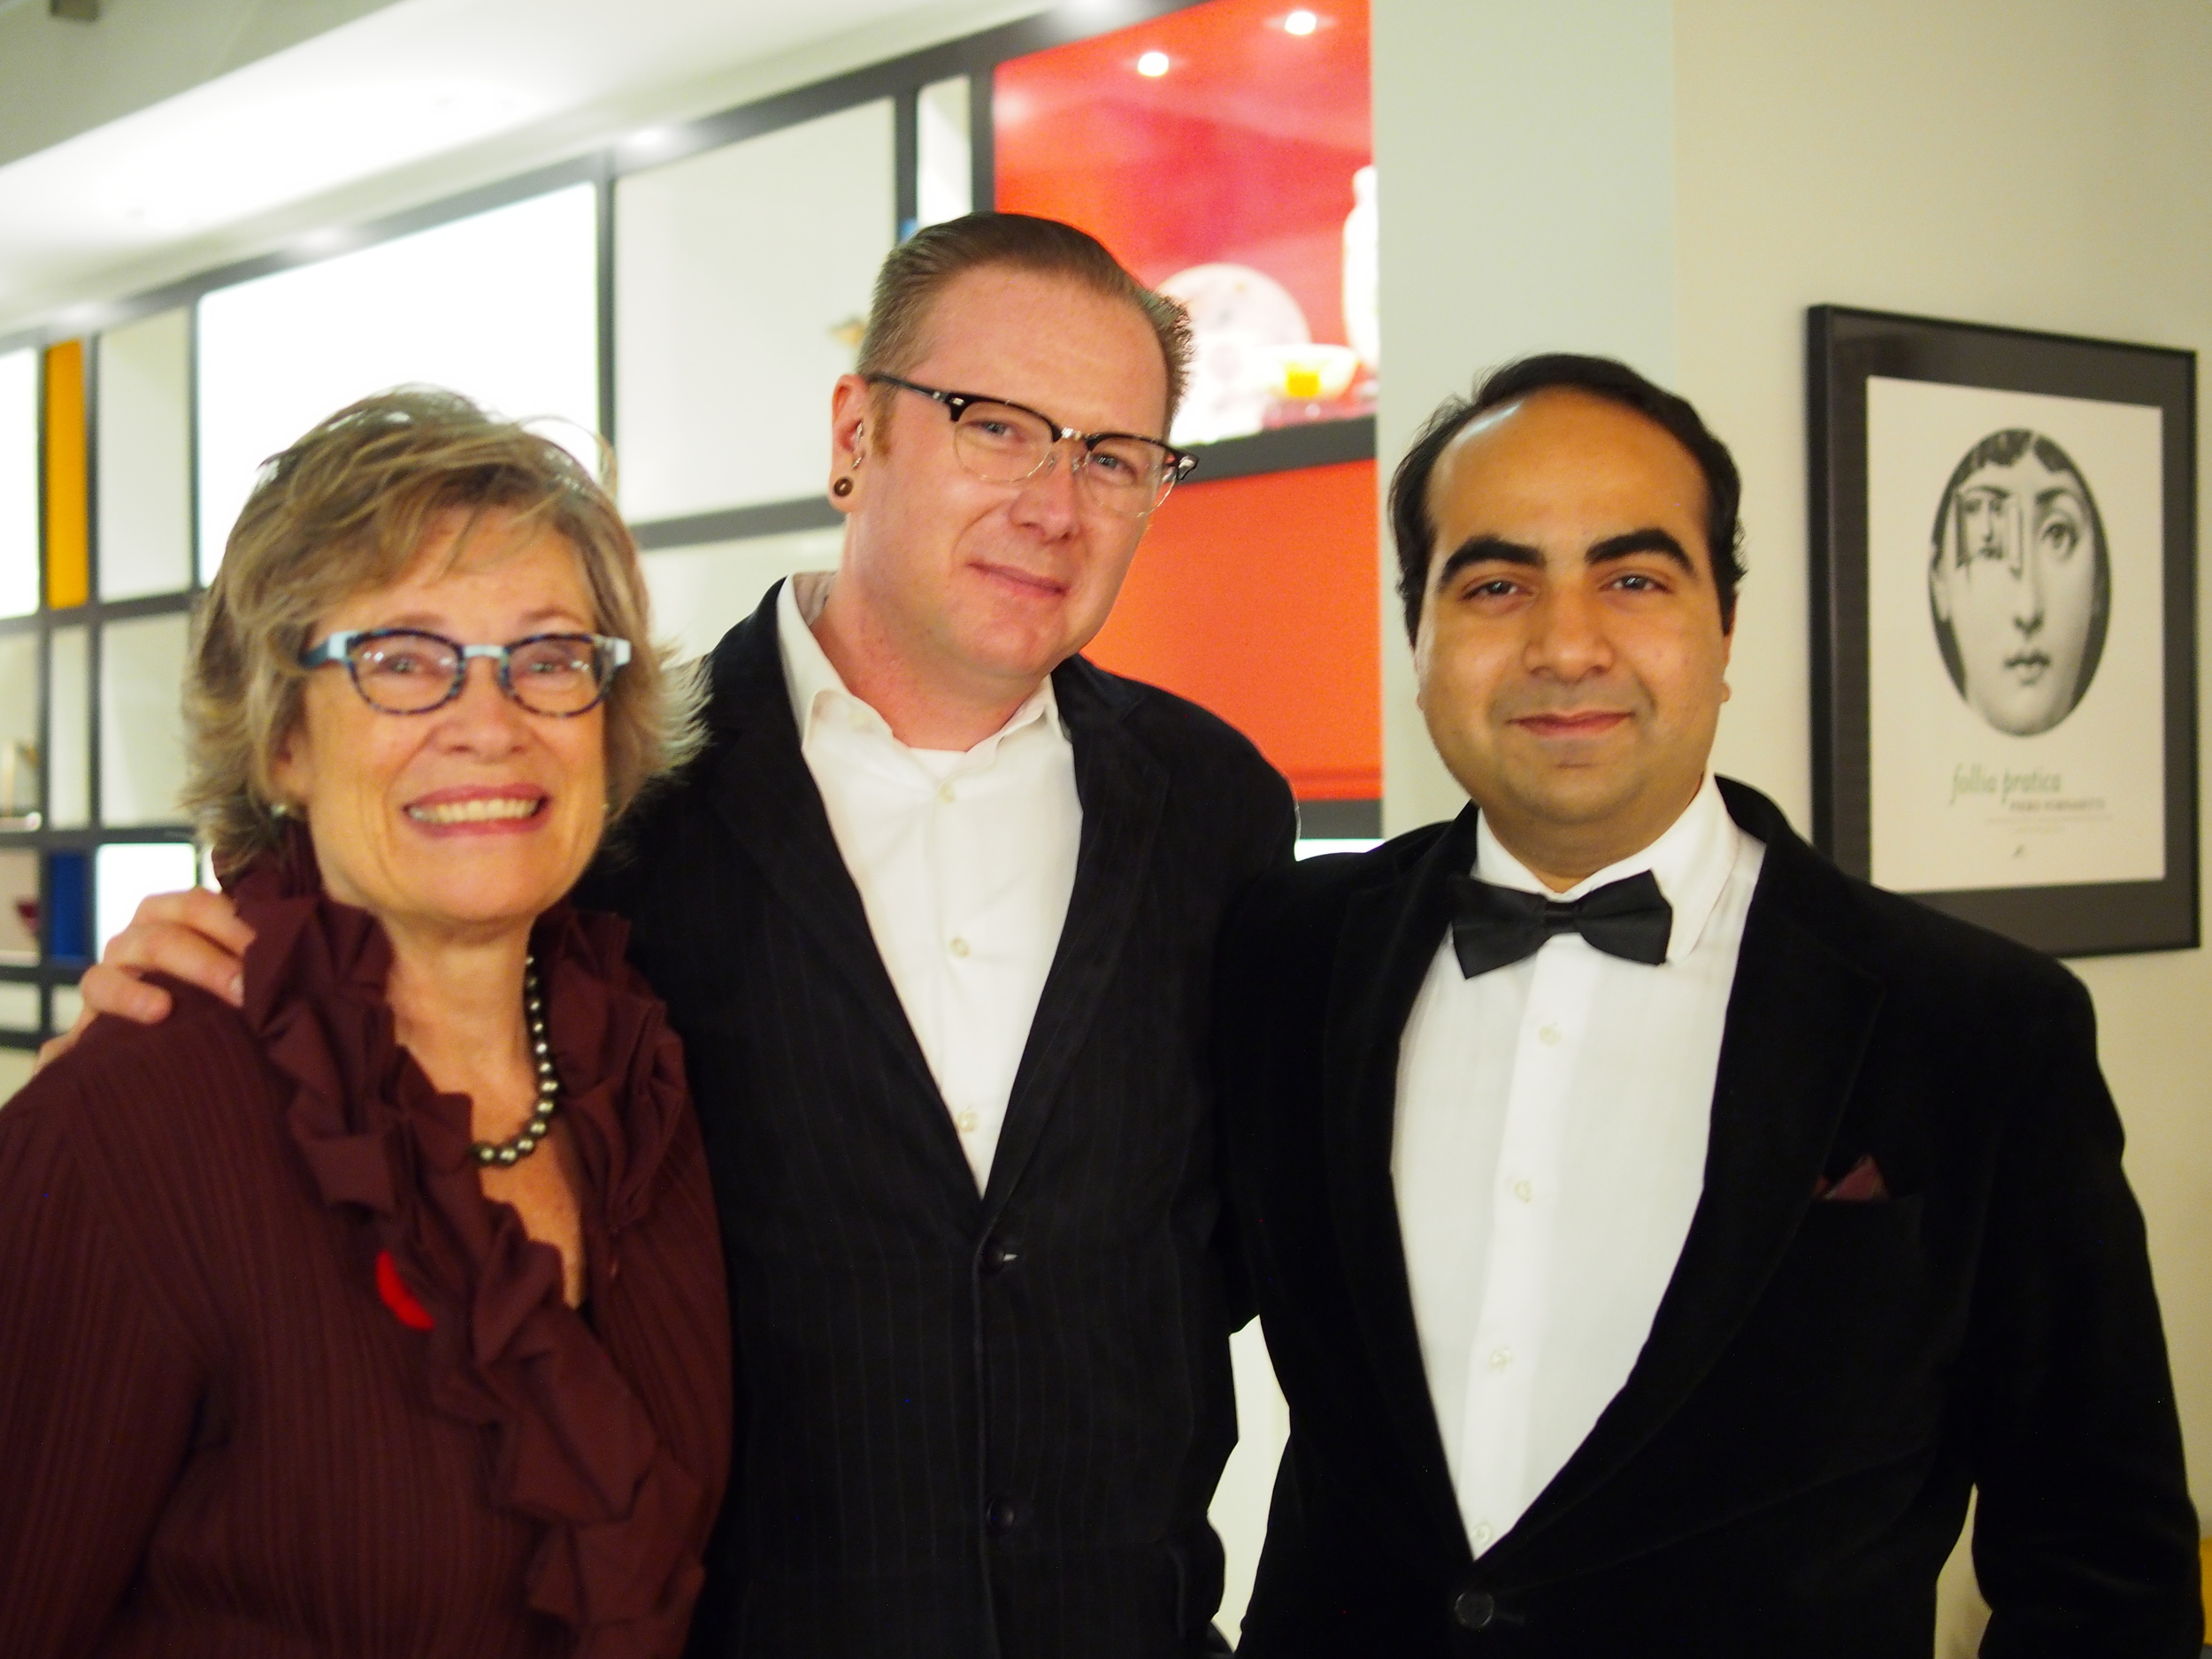 Carol with former book club member, Clayton, and volunteer Jaspreet Tambar.